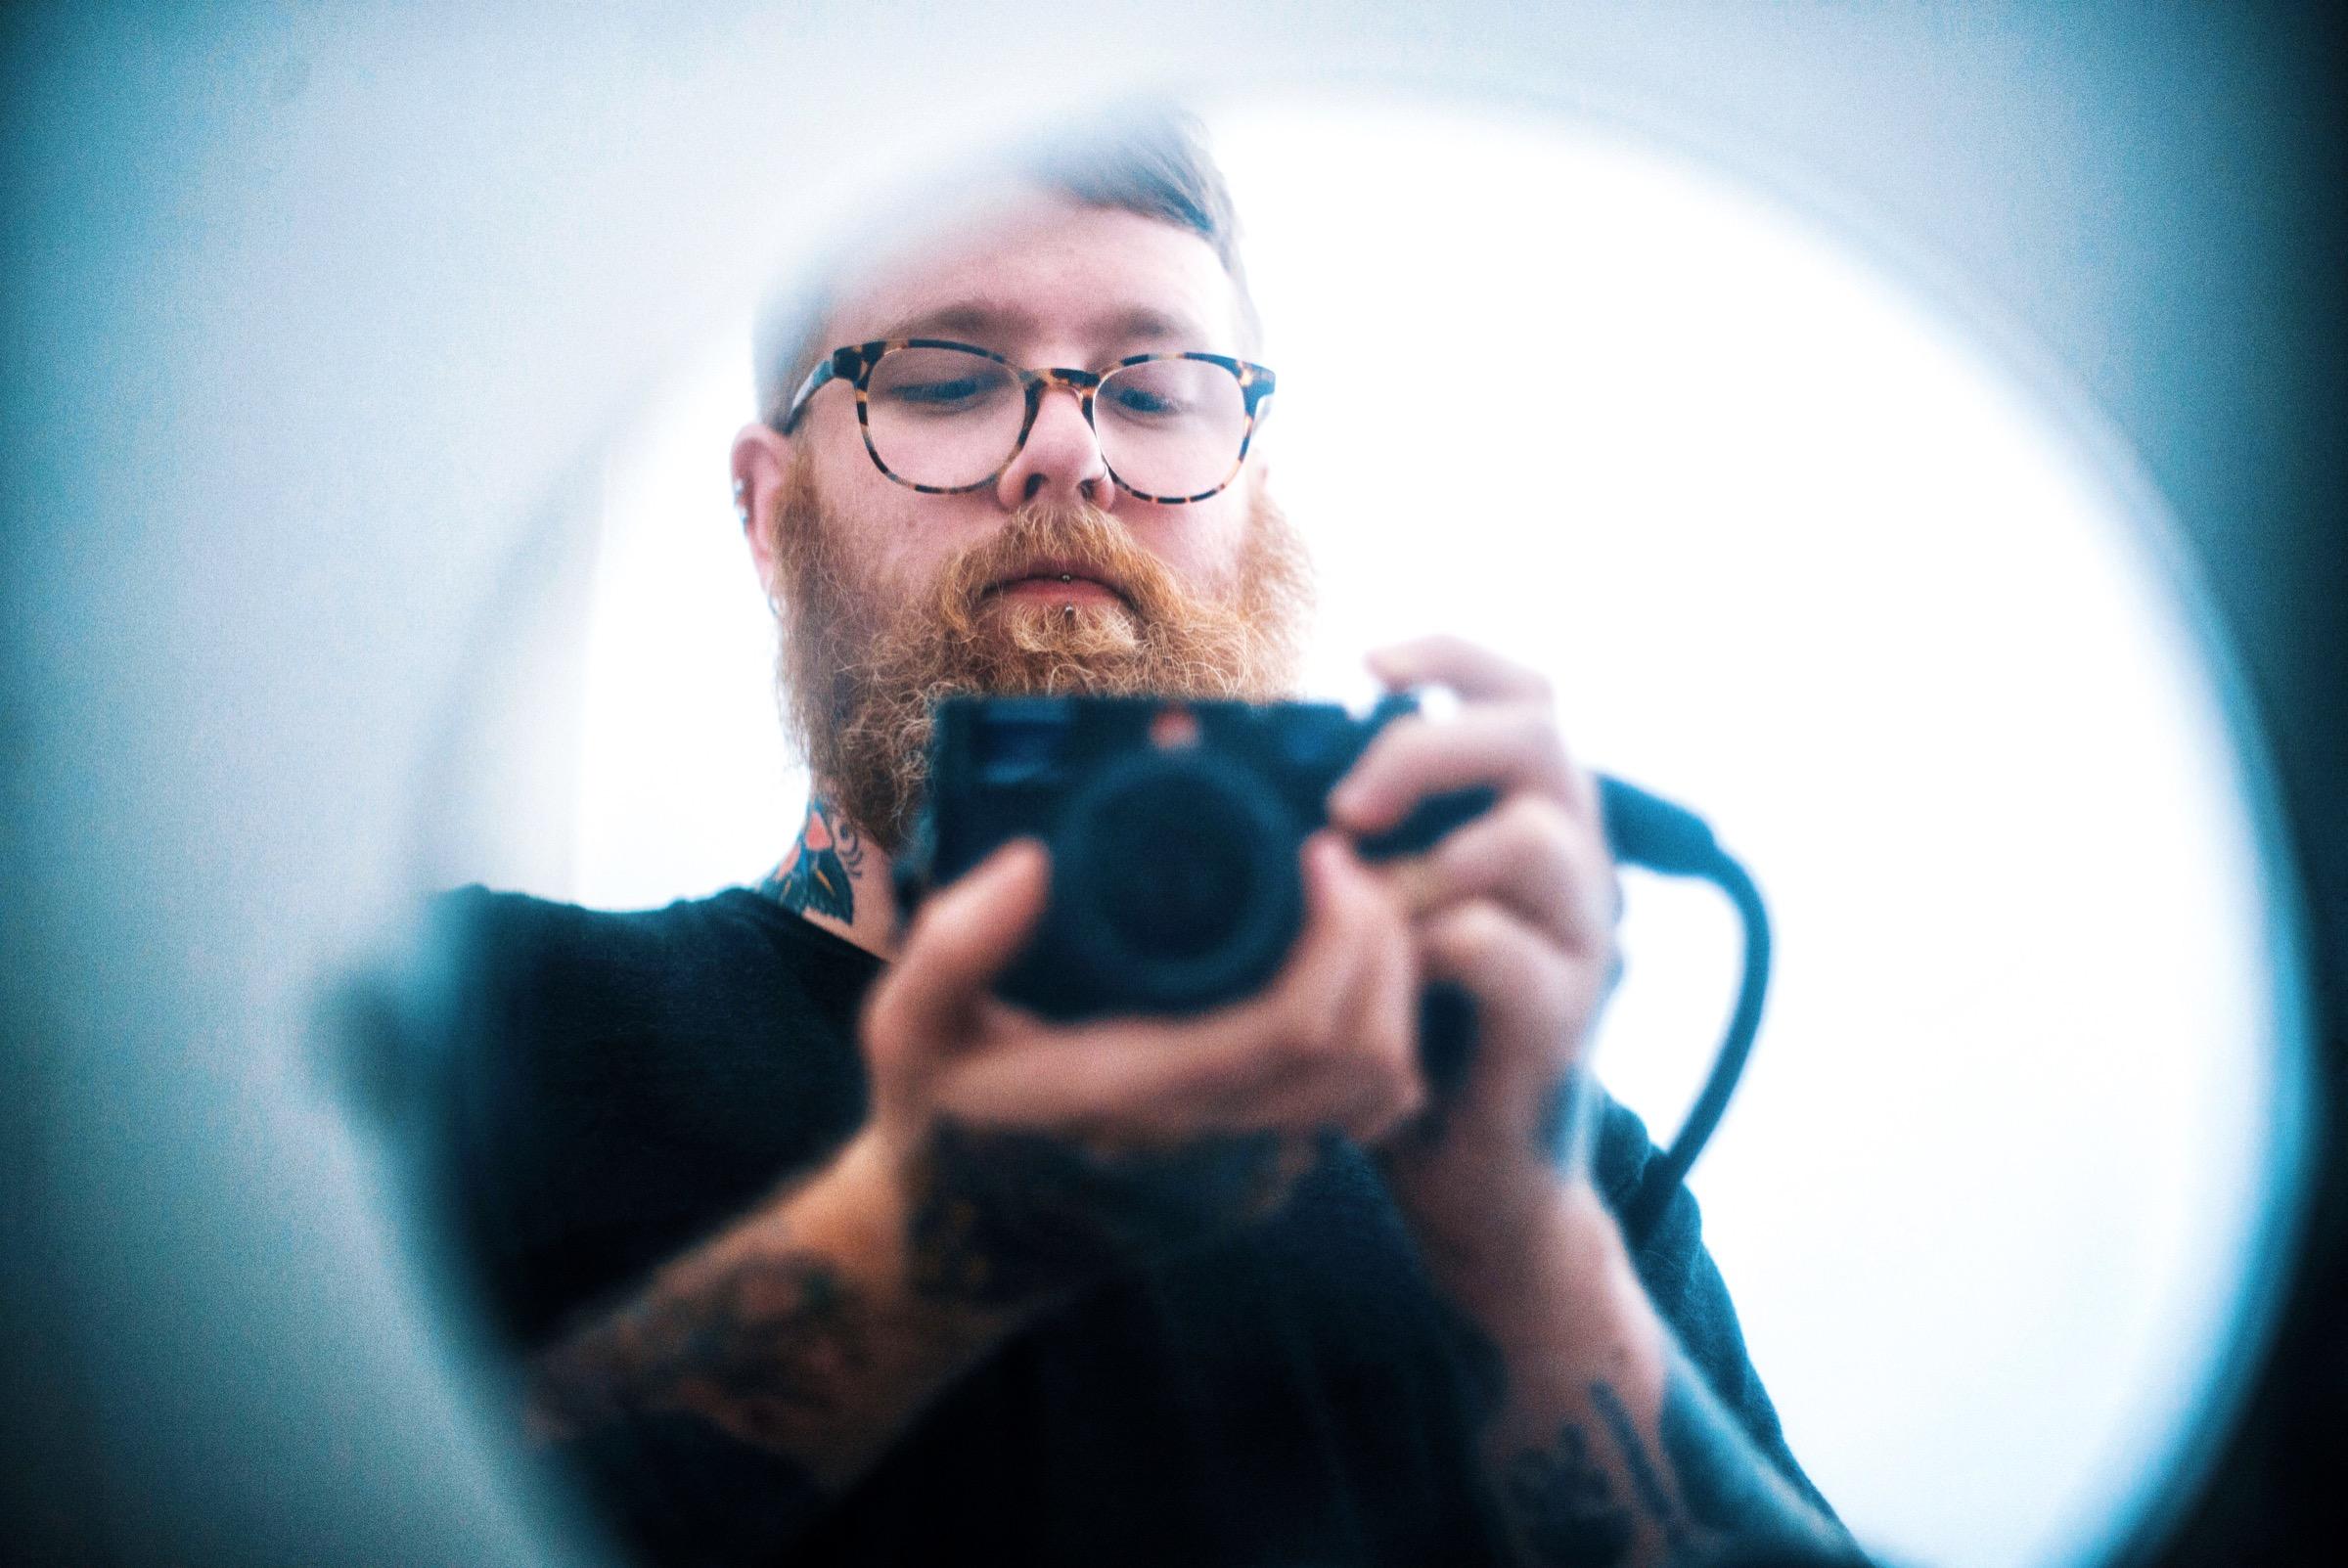 Leica M Typ 240 Super Takumar 50mm f1.4 7 element